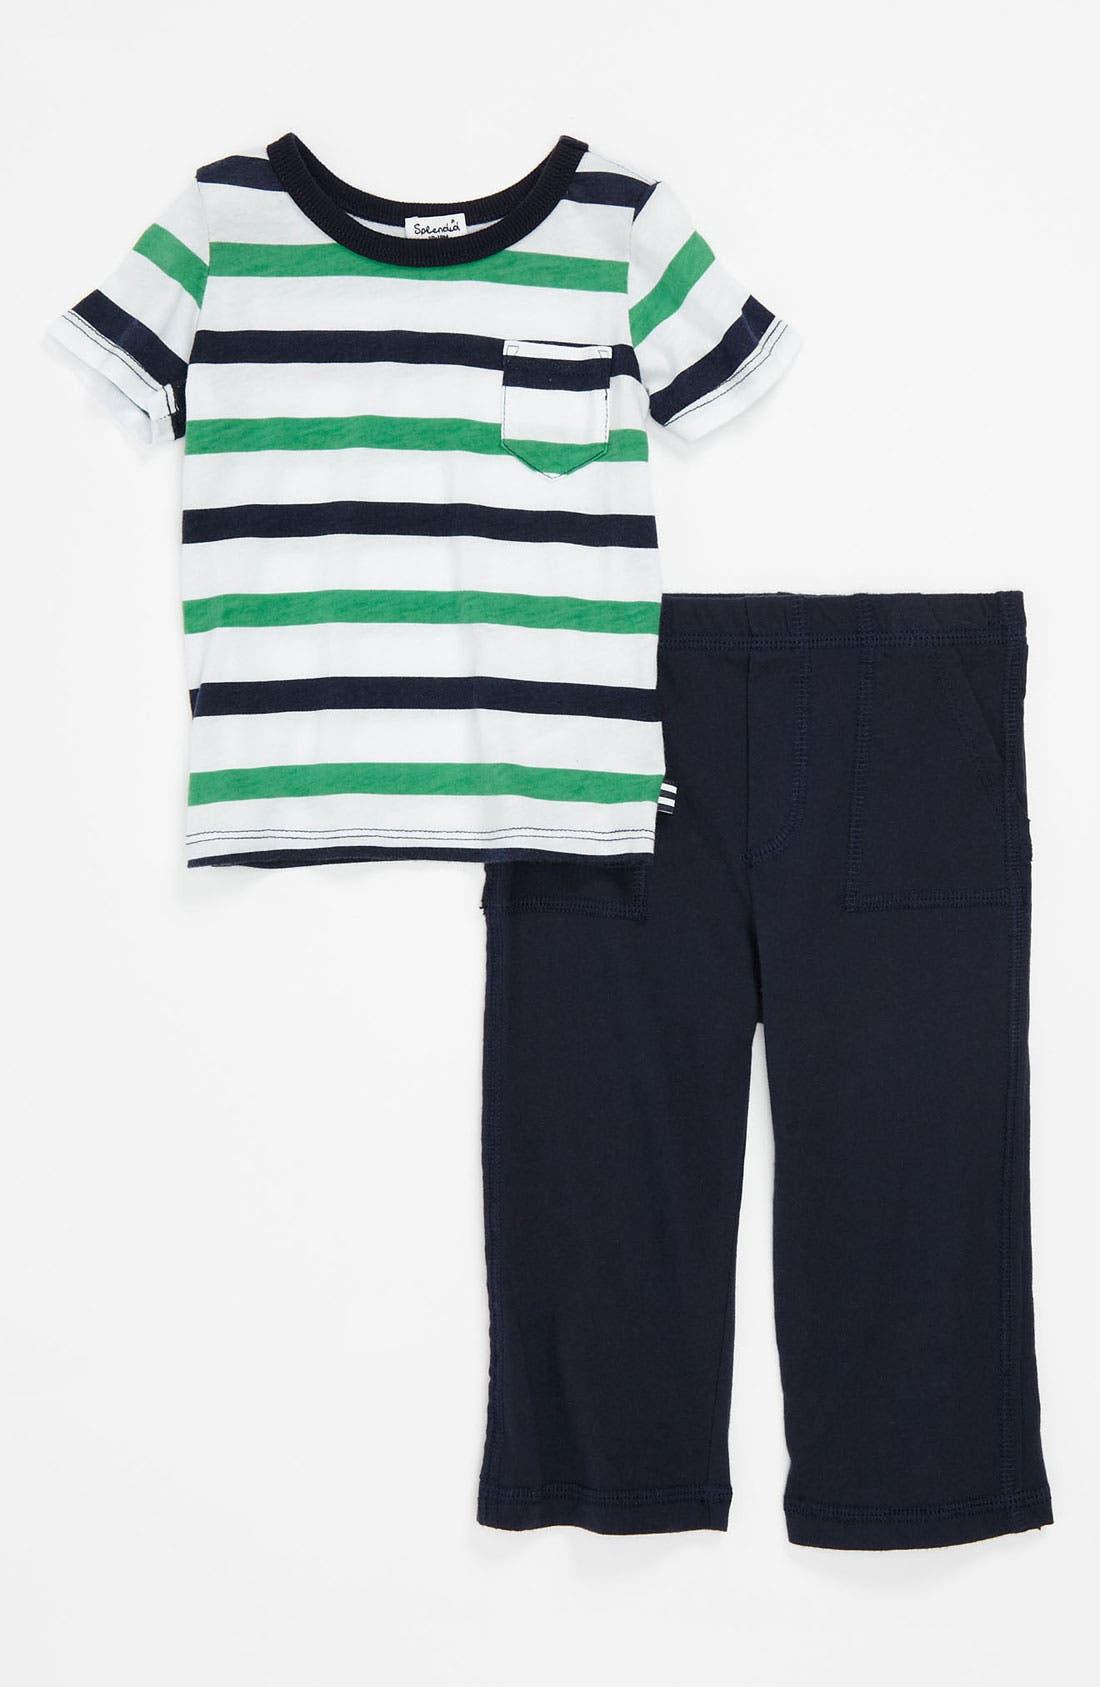 Alternate Image 1 Selected - Splendid Stripe Top & Knit Pants (Toddler)